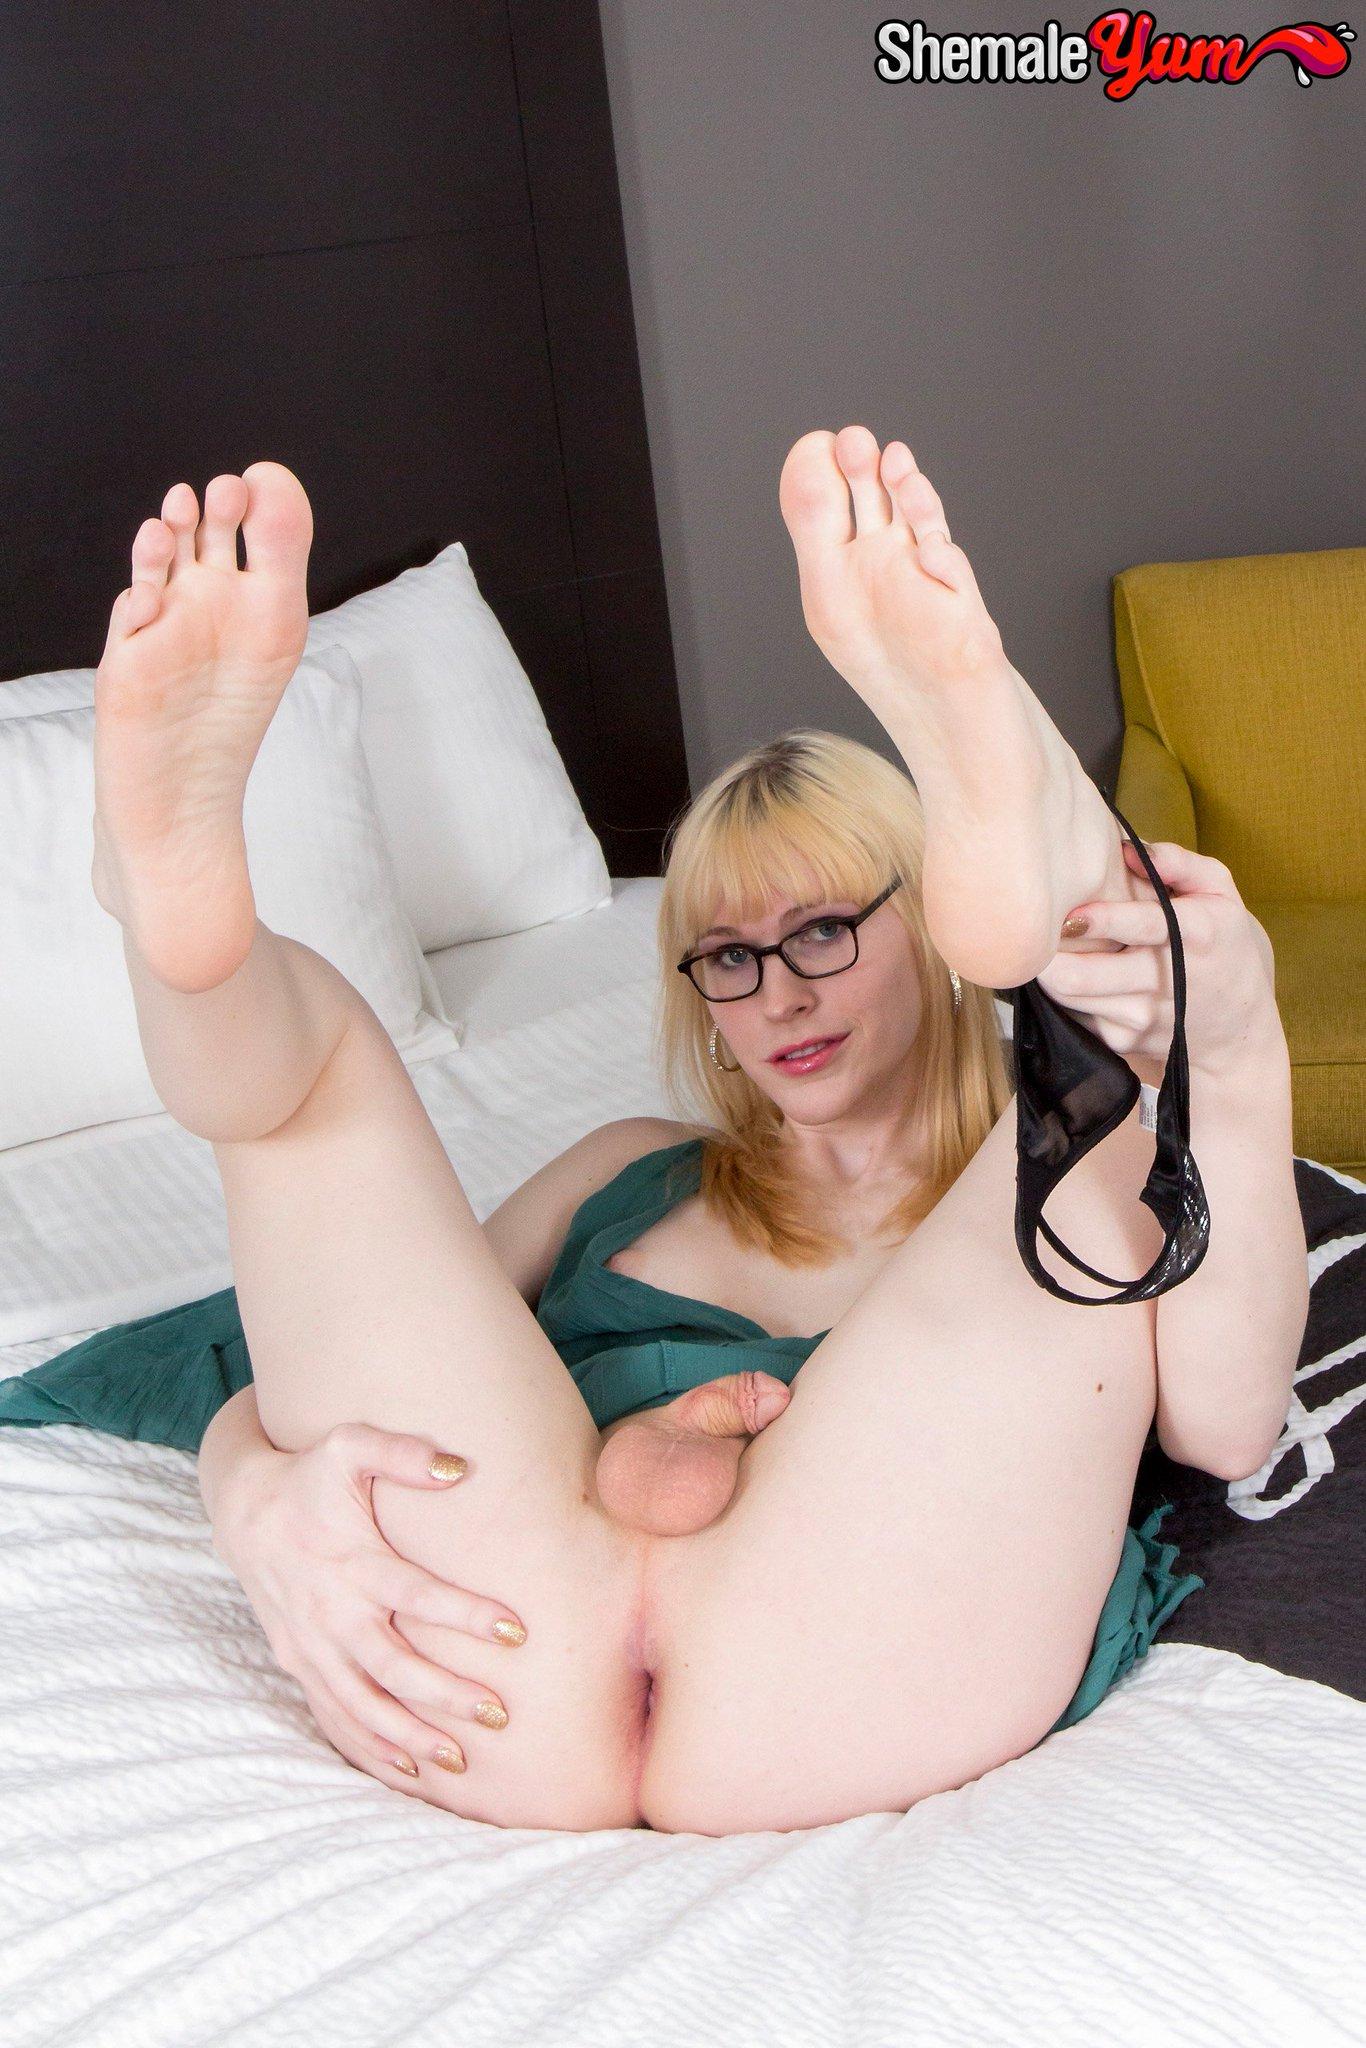 Lianna lawson porn